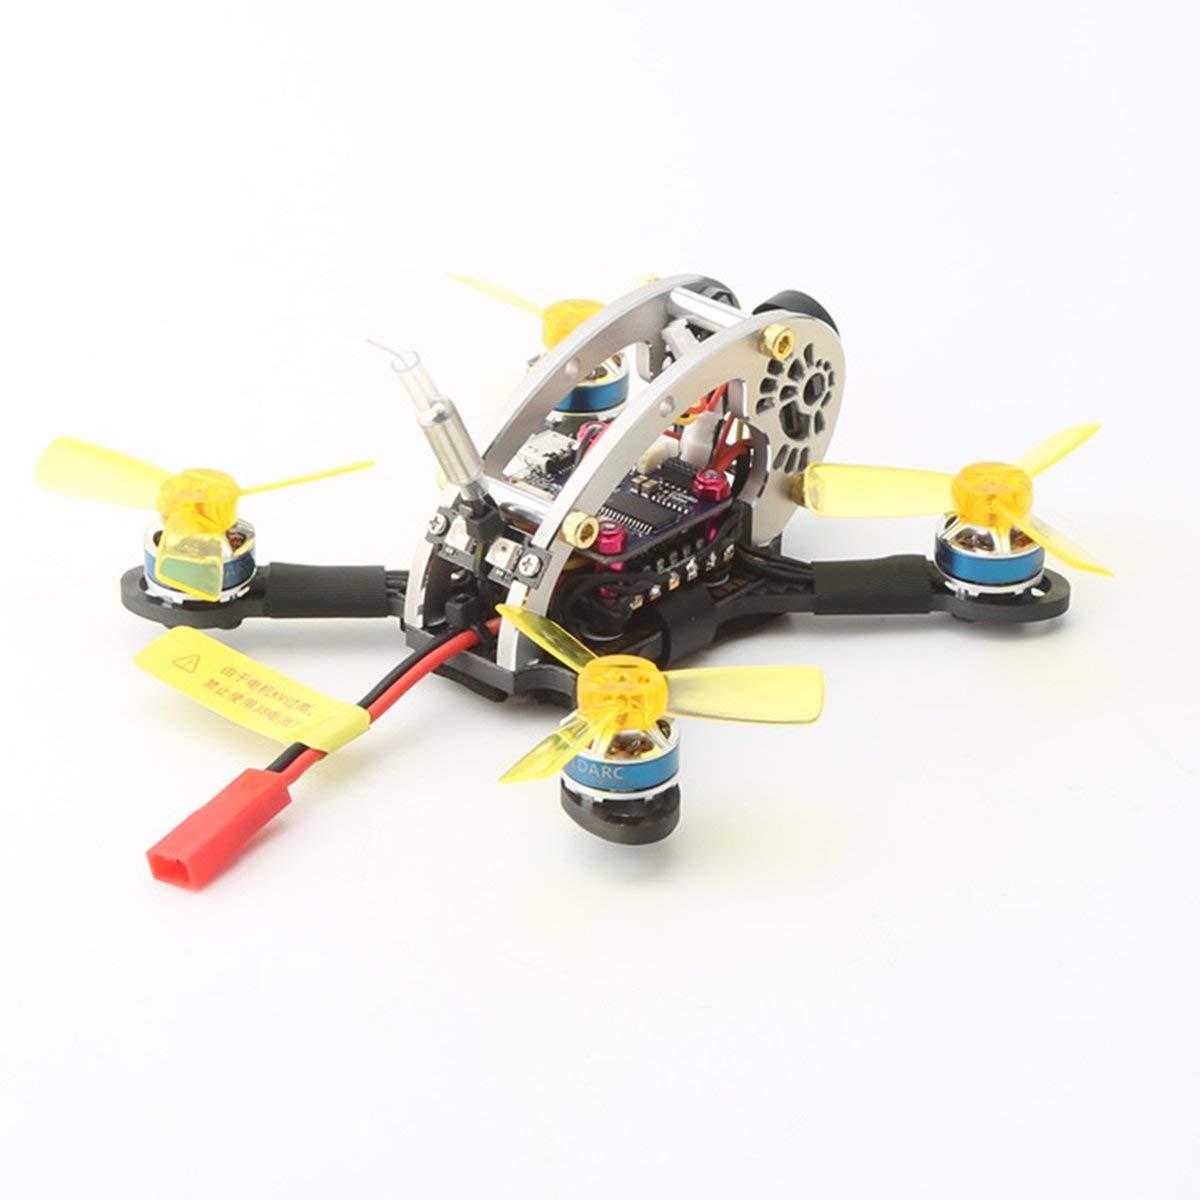 Gugutogo Drohne mit Kamera LDARC Flyegg 100 V2 5.8G Brushless OSD-Kamera Mini FPV RC Racing Drohne PNP